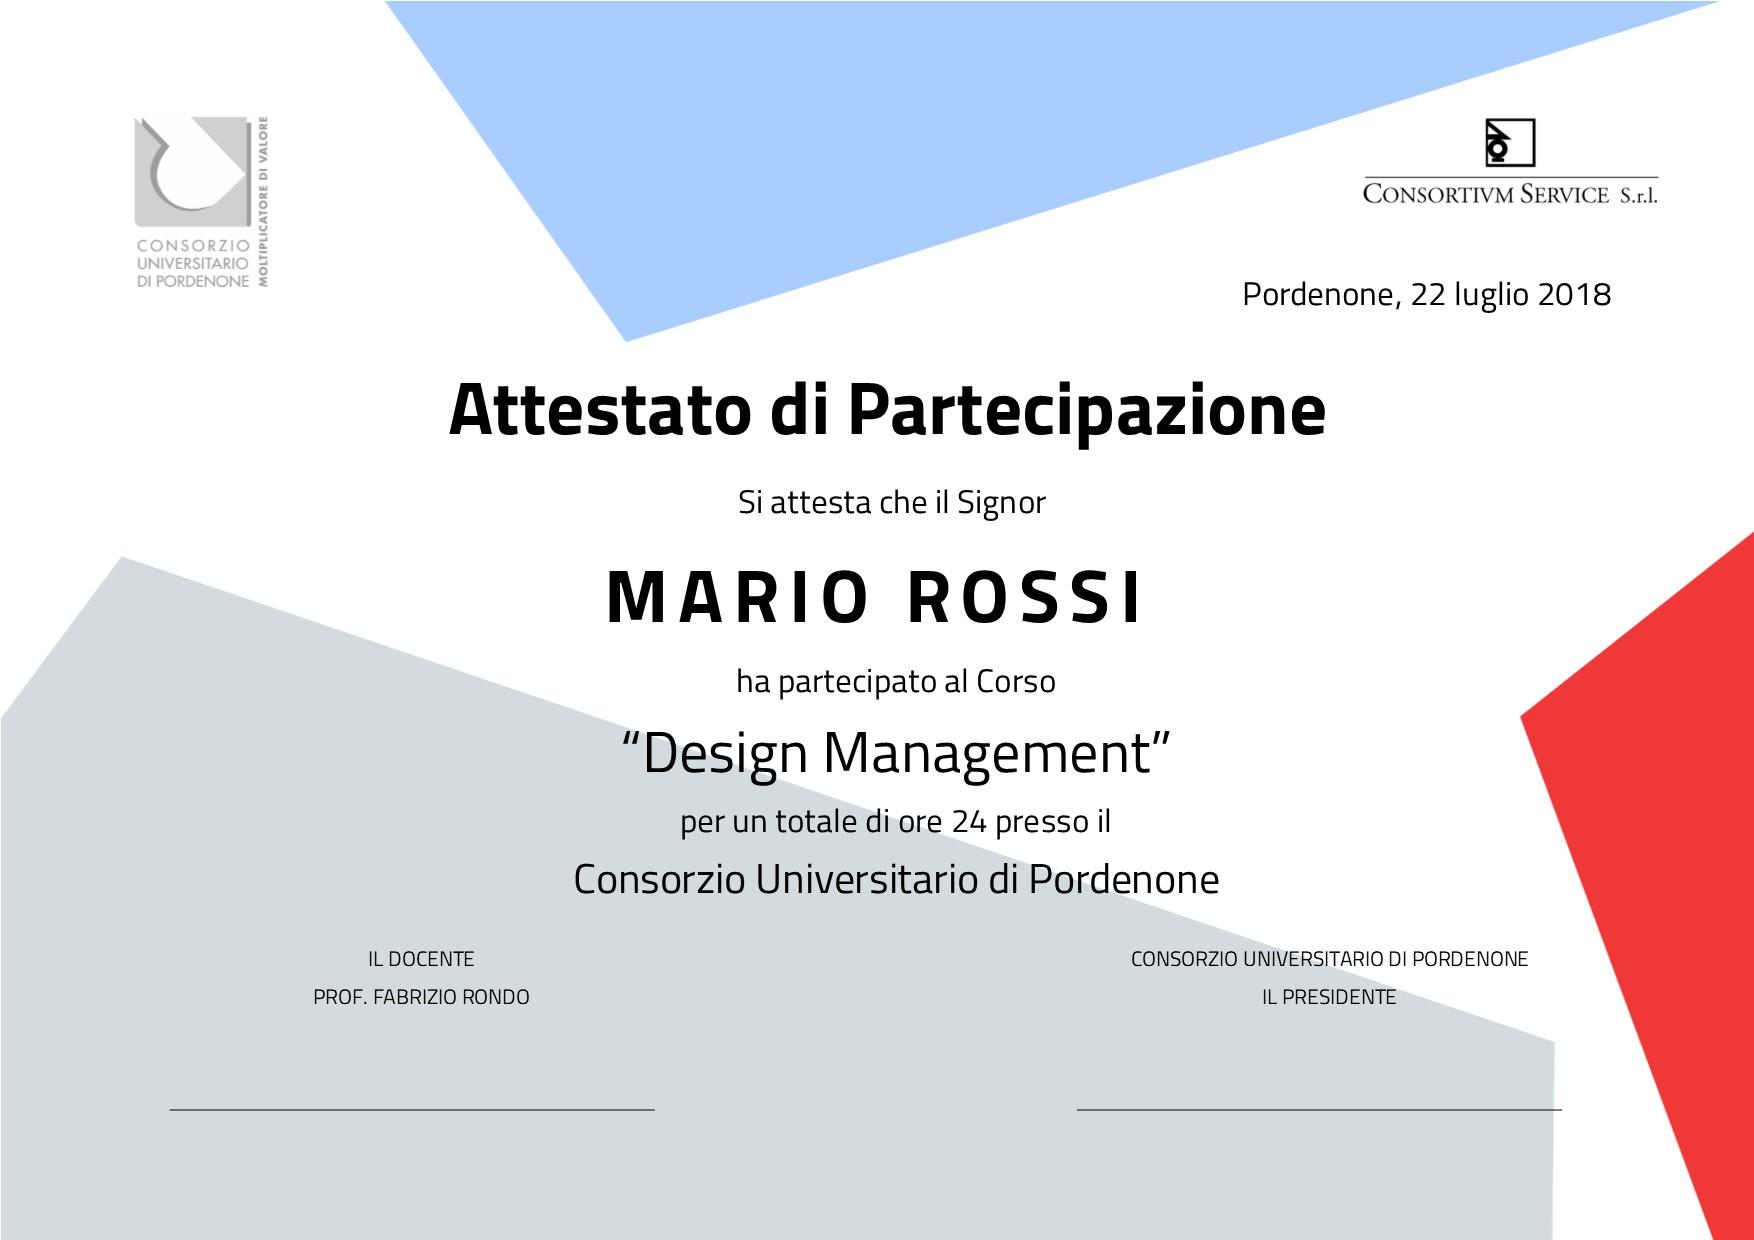 Corso Design Management Consortium Service